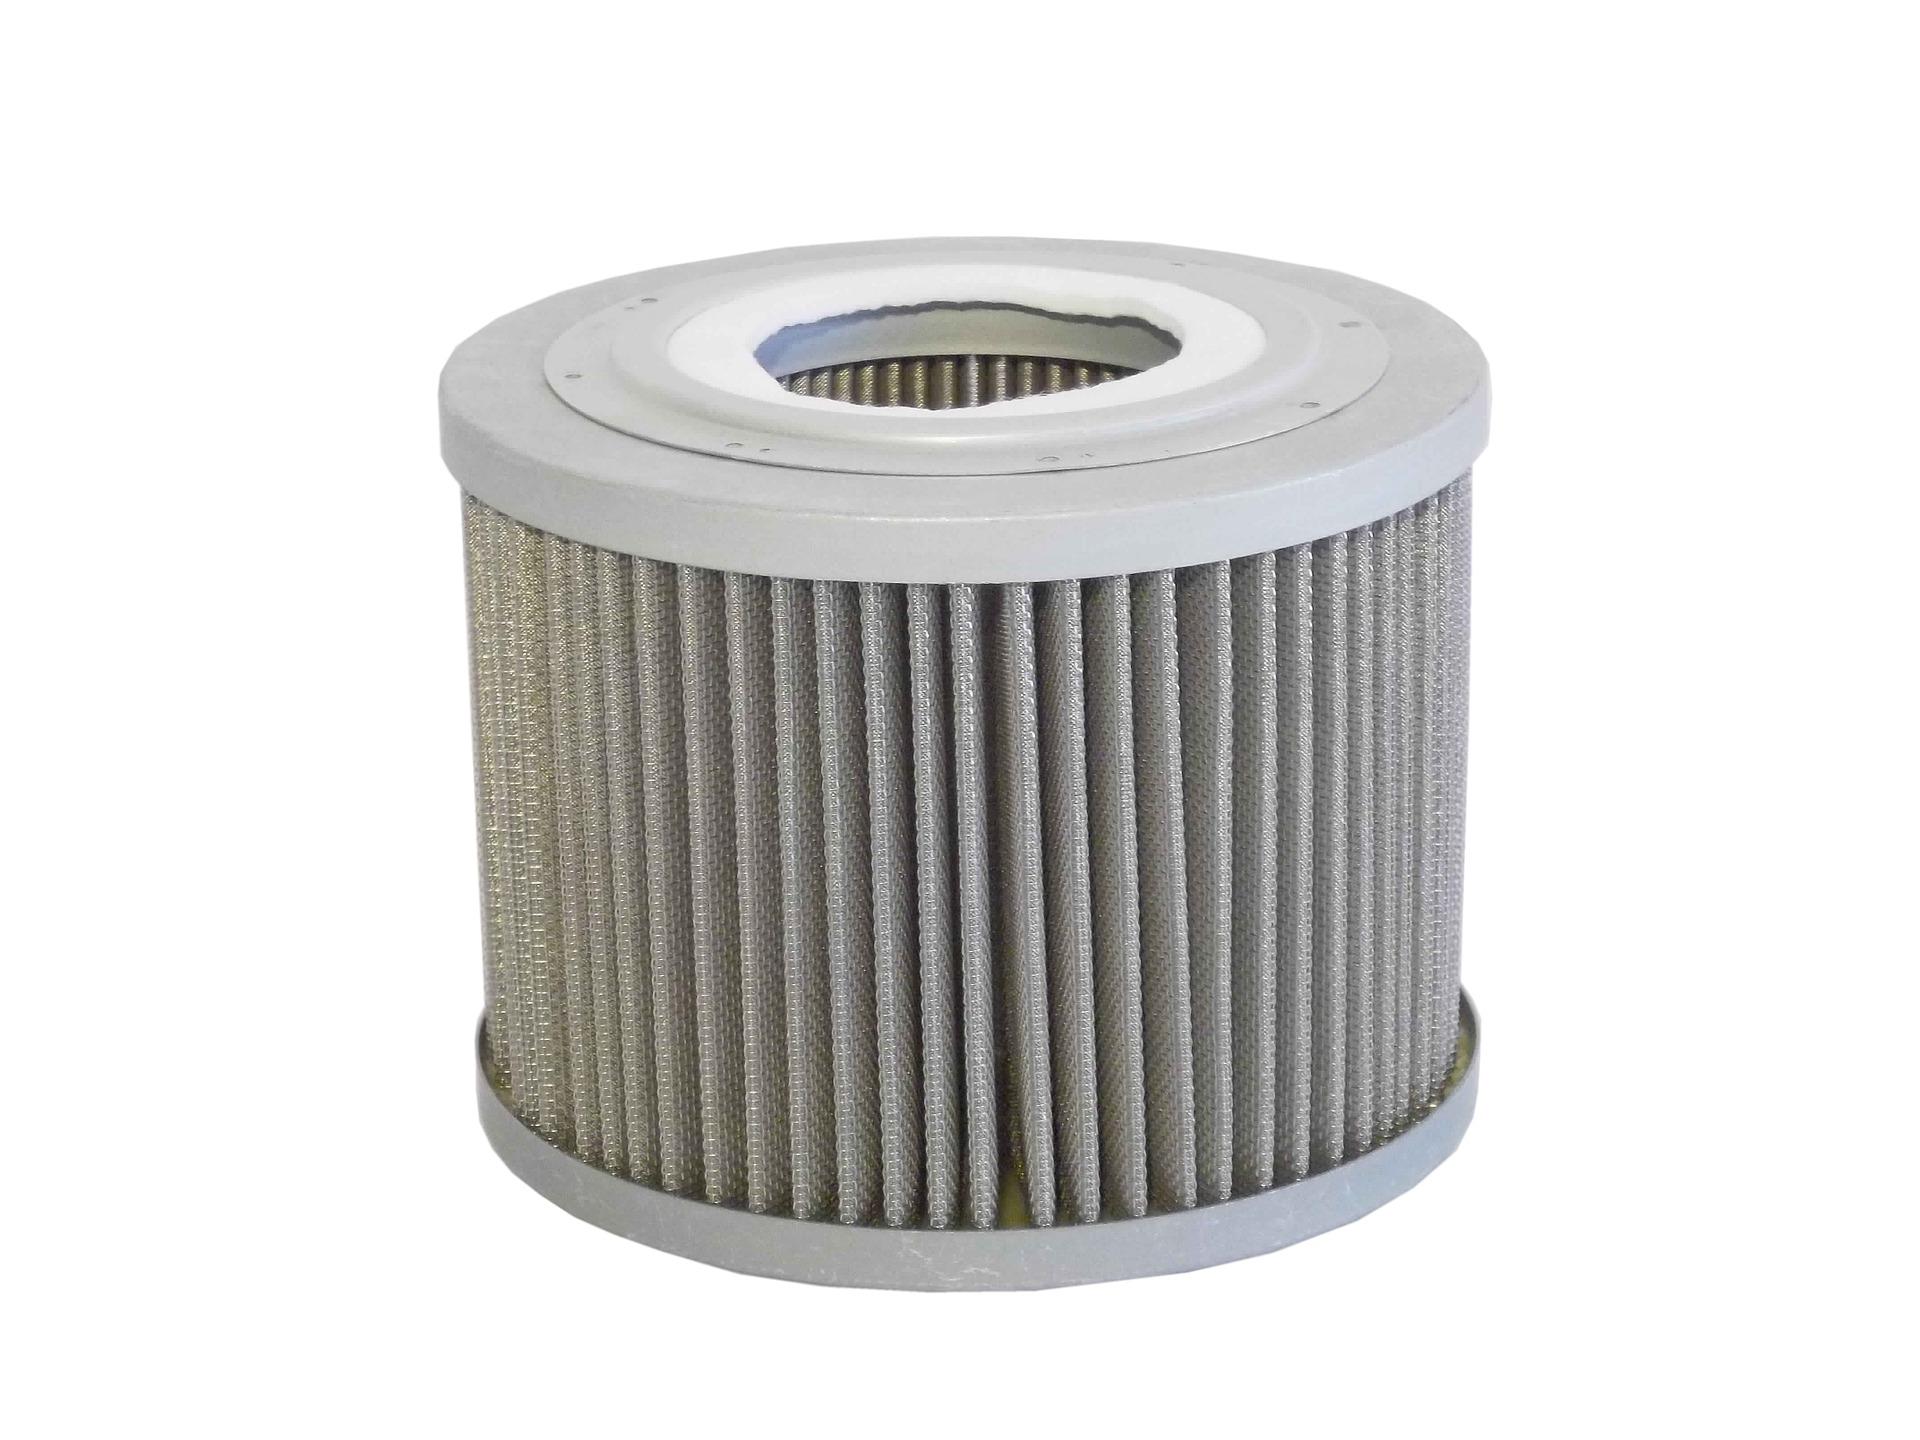 filtr powietrza do mecalac